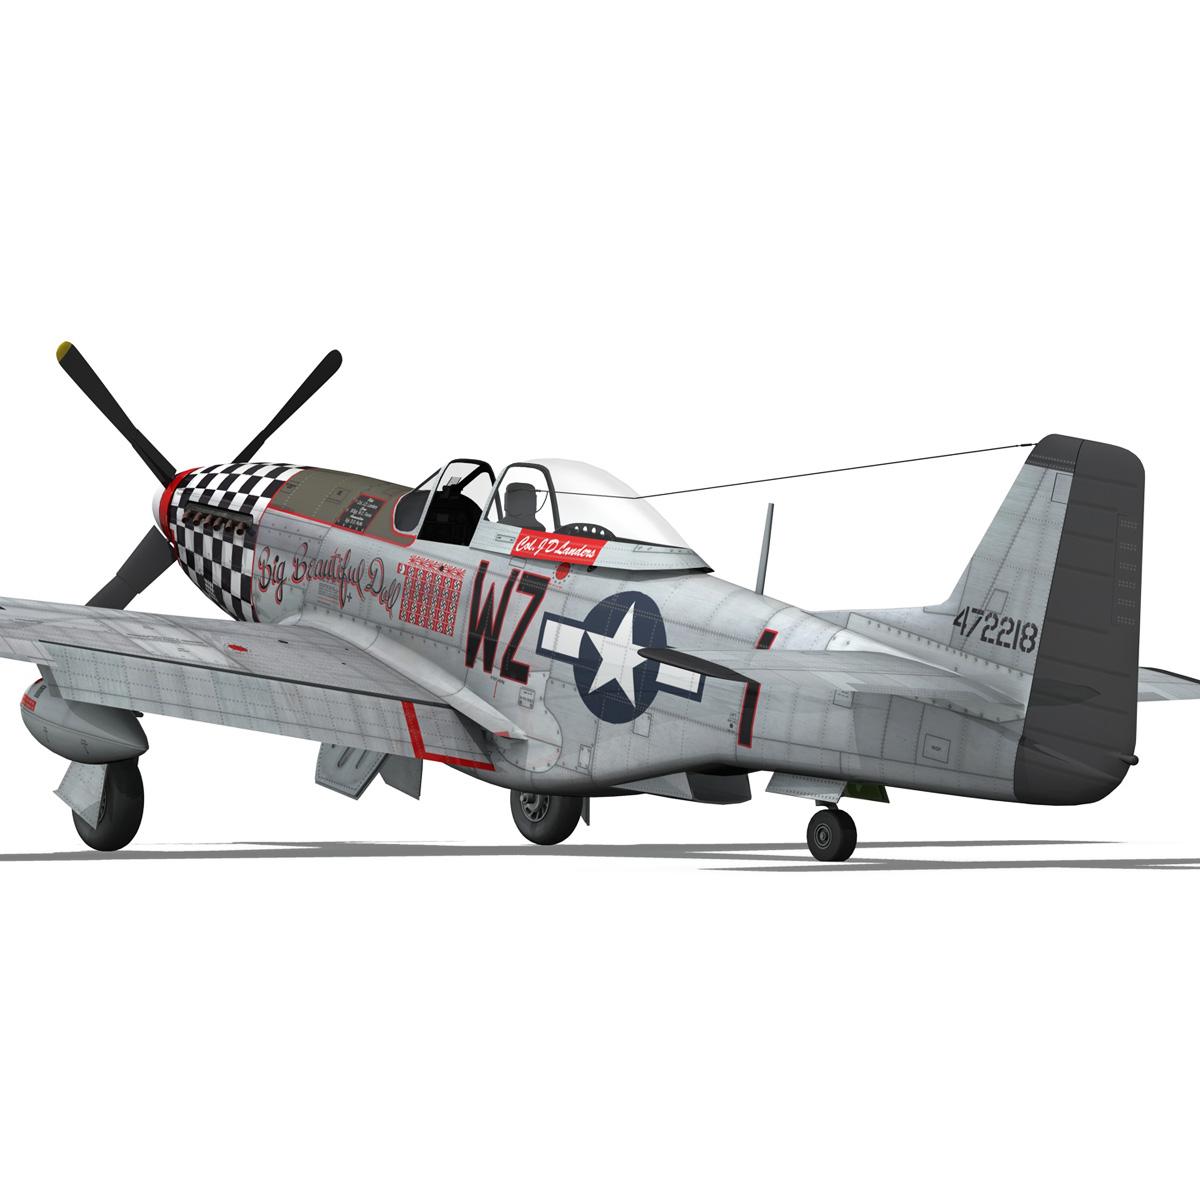 north american p-51d mustang – big beautiful doll 3d model fbx c4d lwo obj 282564